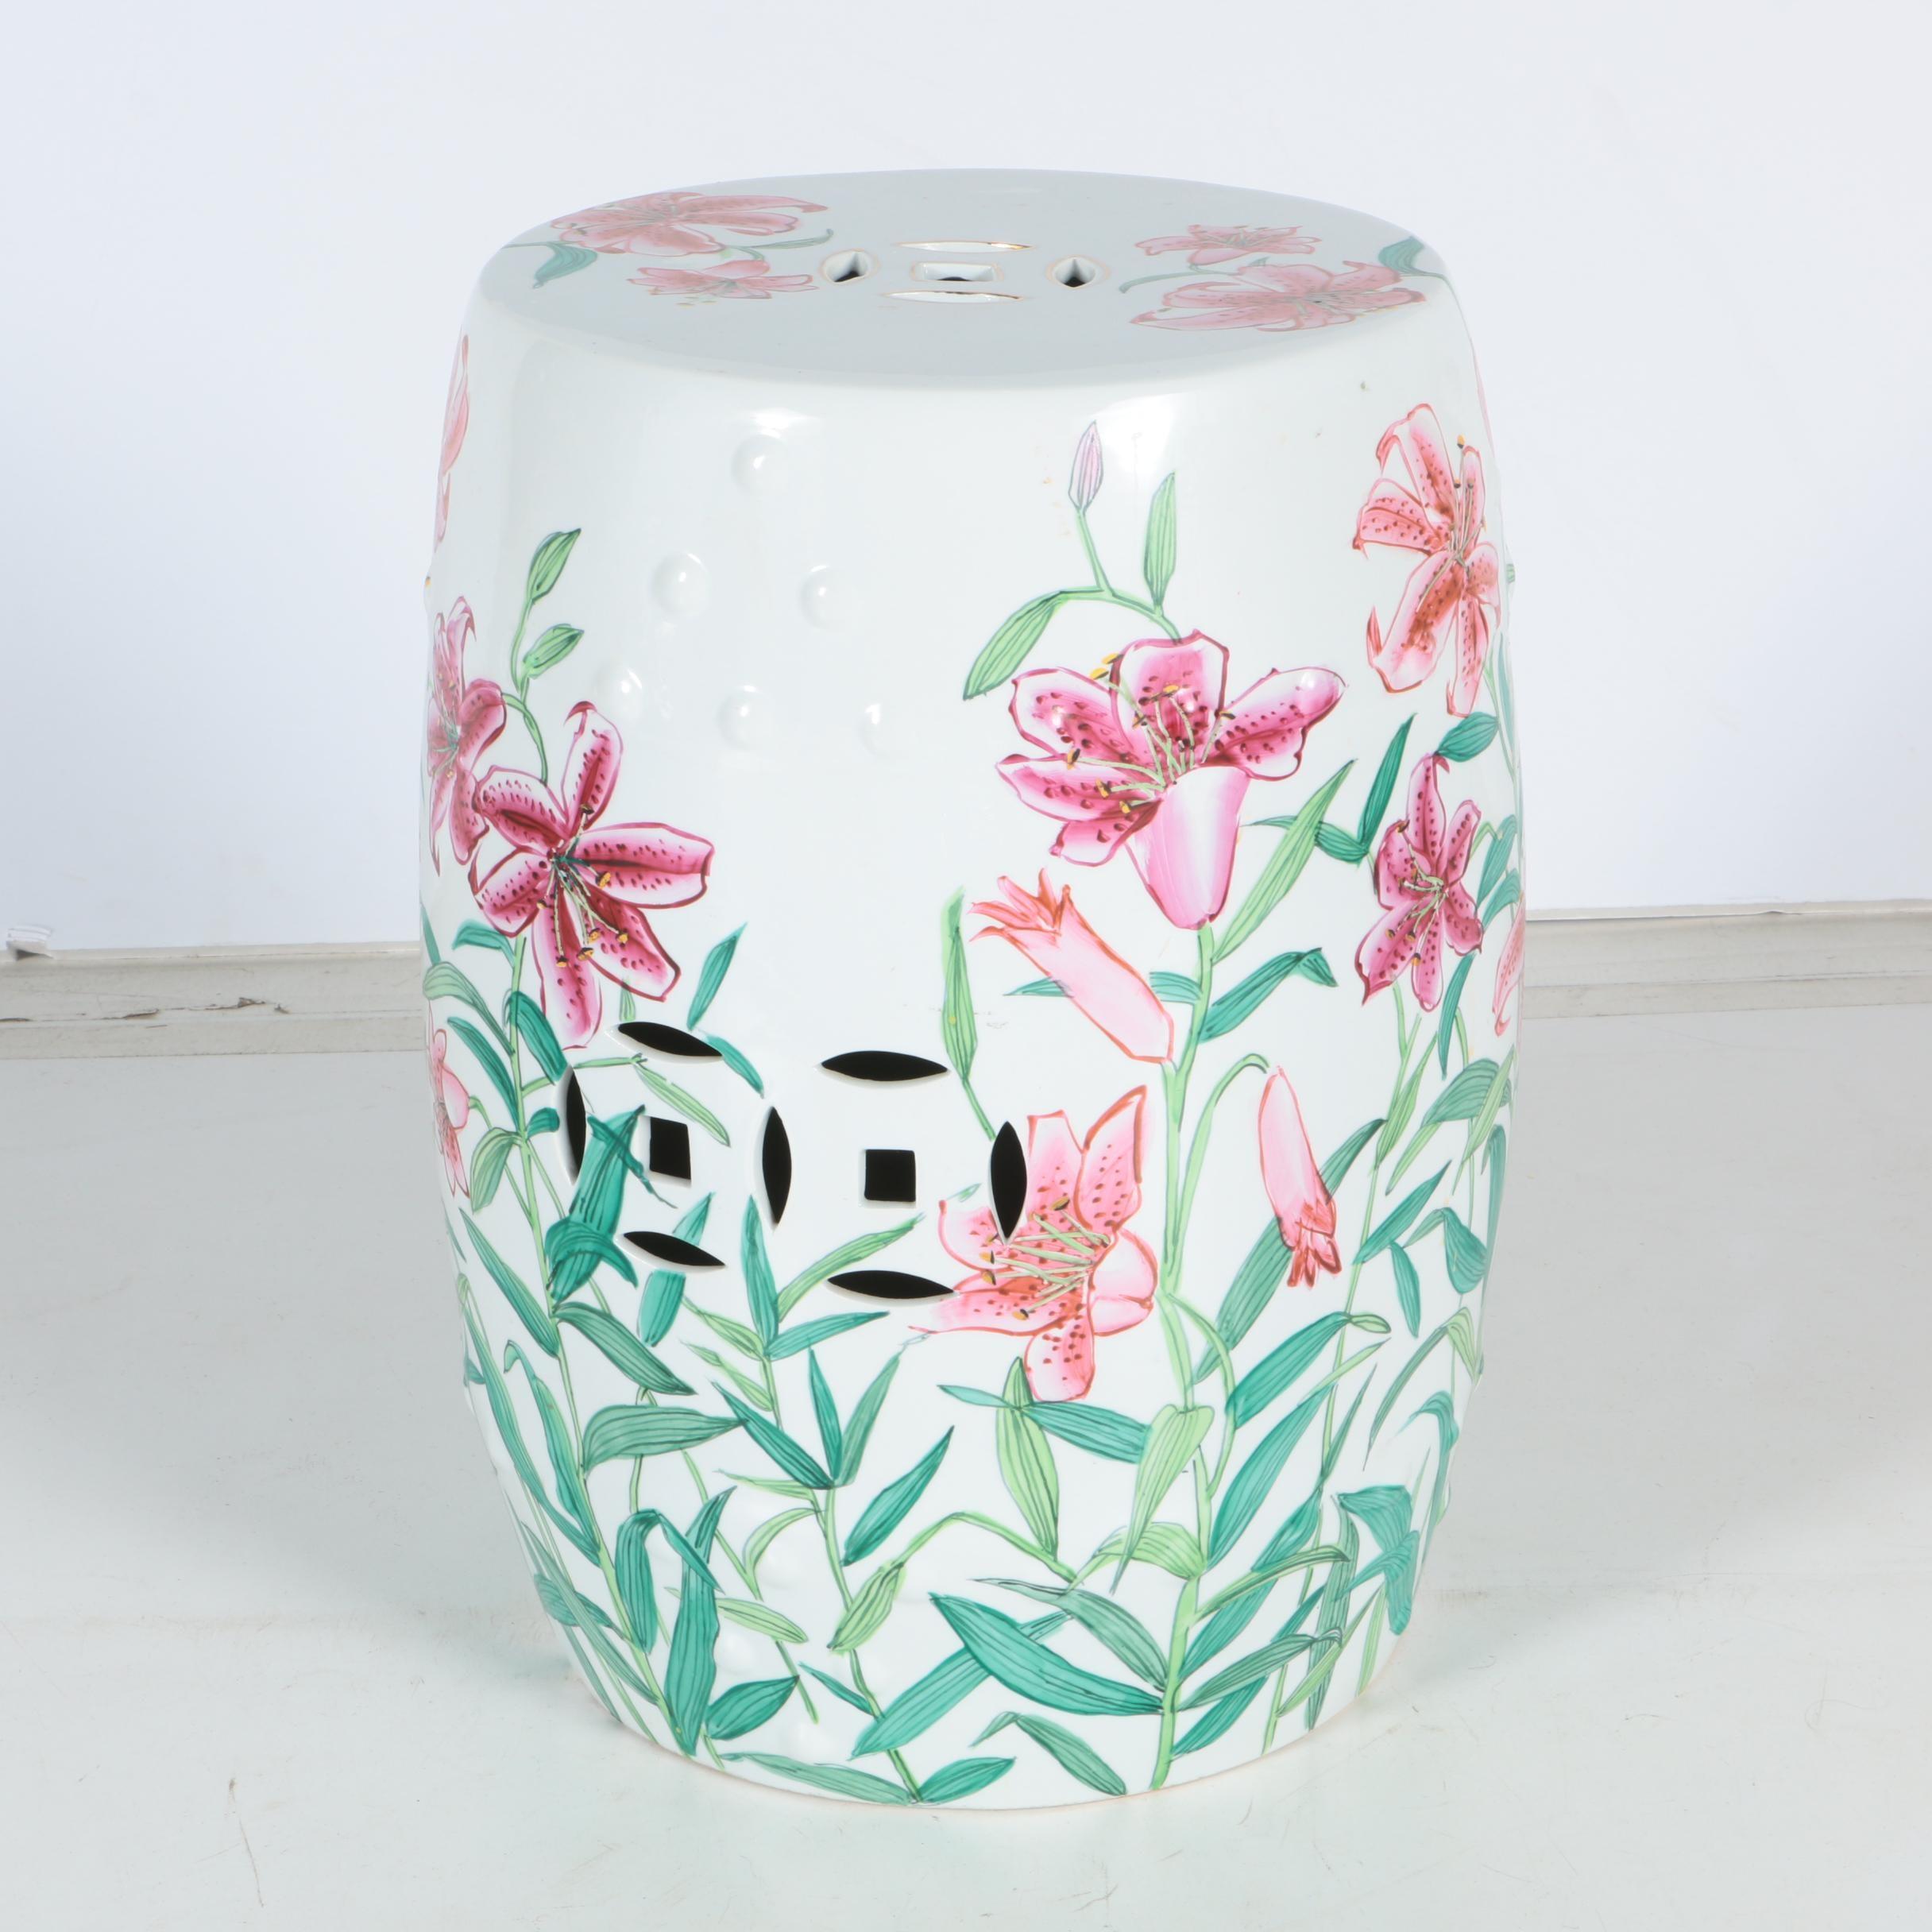 Ceramic Garden Stool with Floral Design